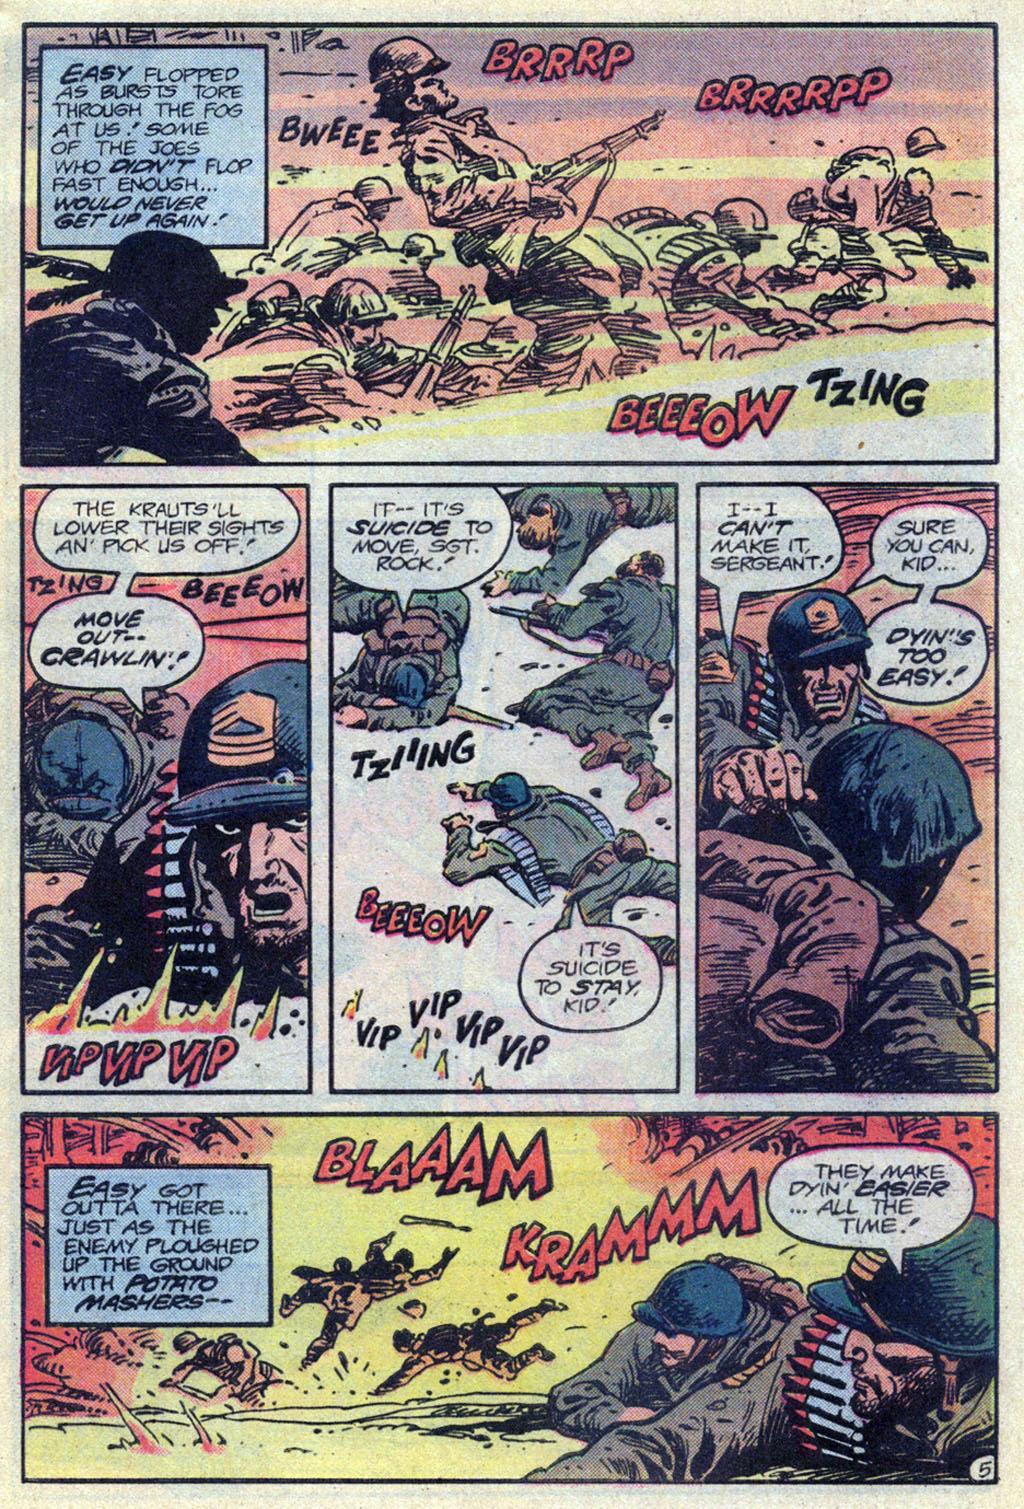 Read online Sgt. Rock comic -  Issue #369 - 5